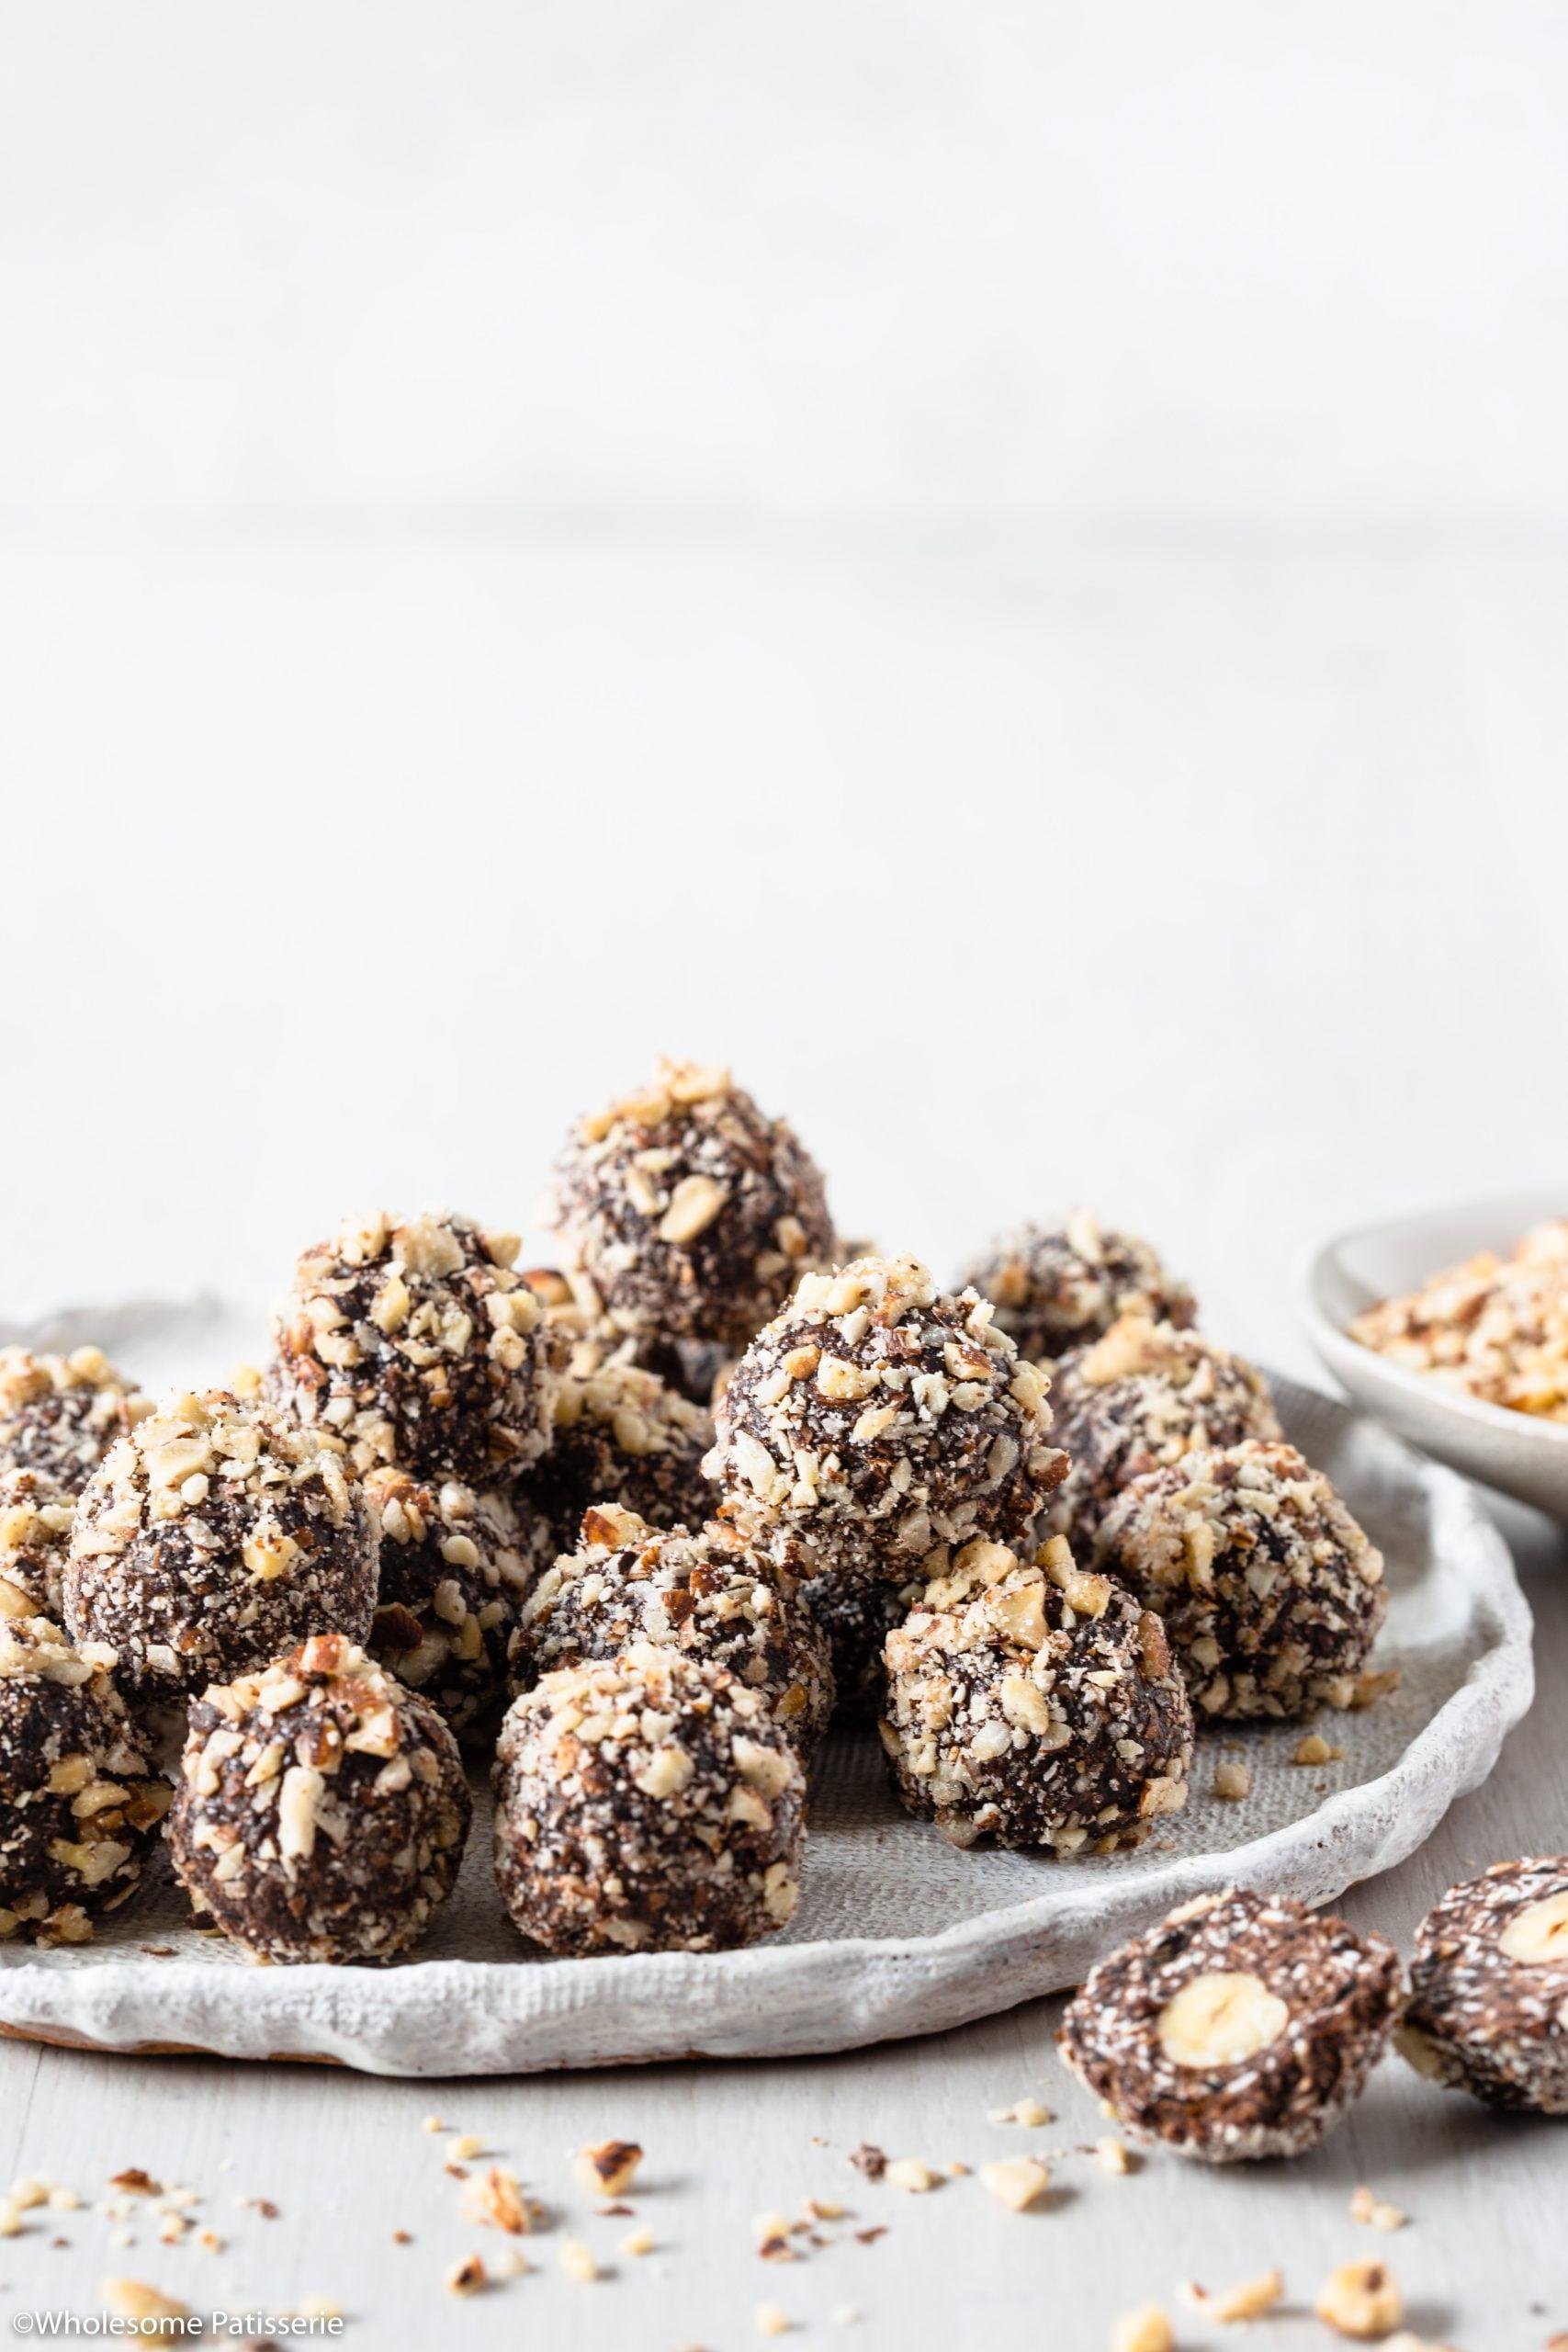 Hazelnut Chocolate Bliss Balls